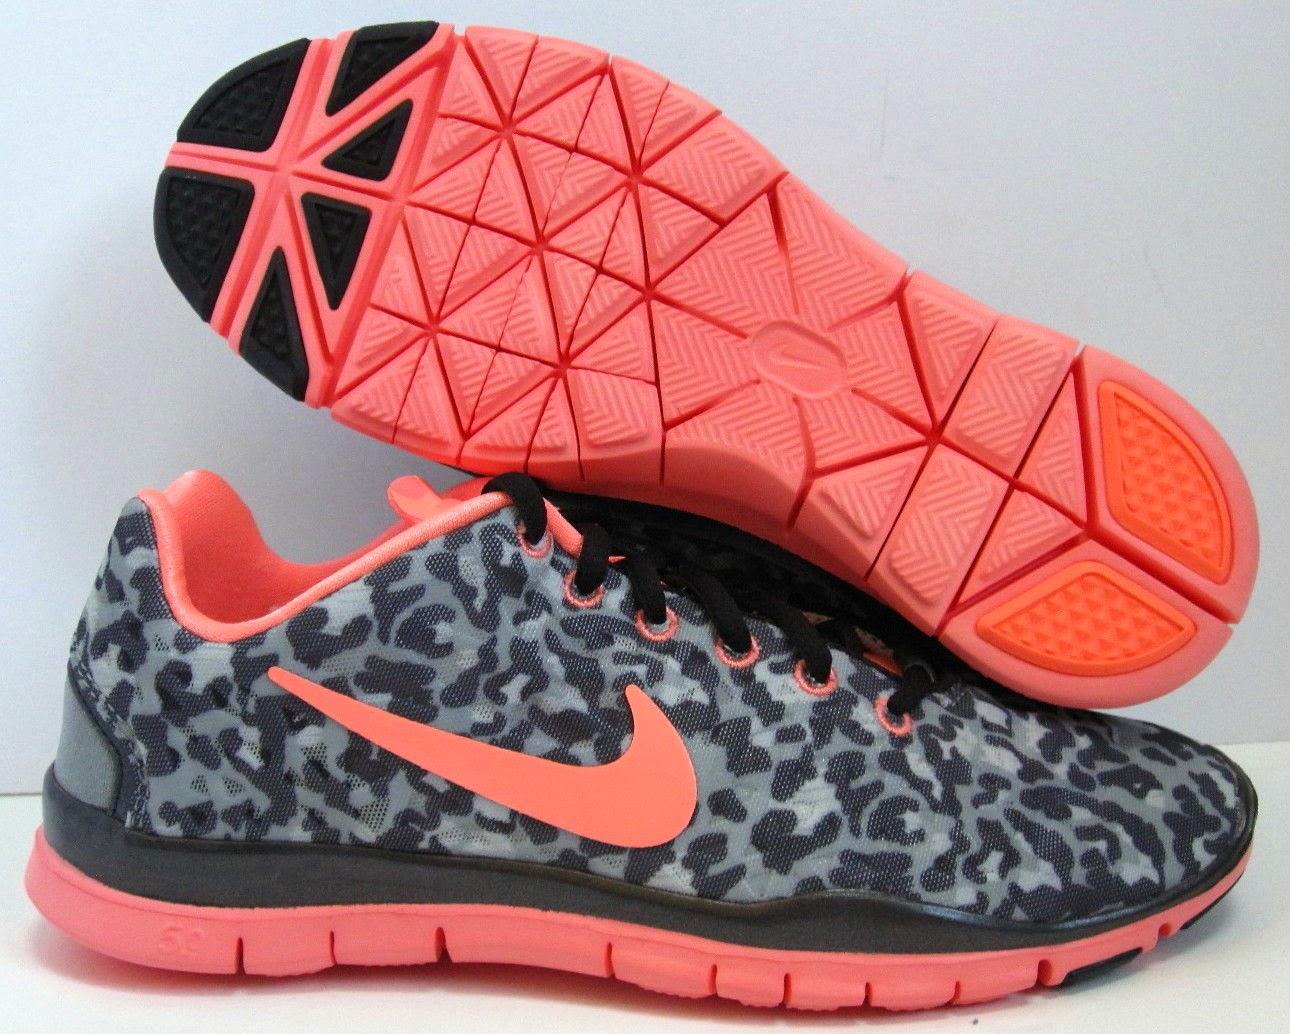 Cheetah Print Running Shoes